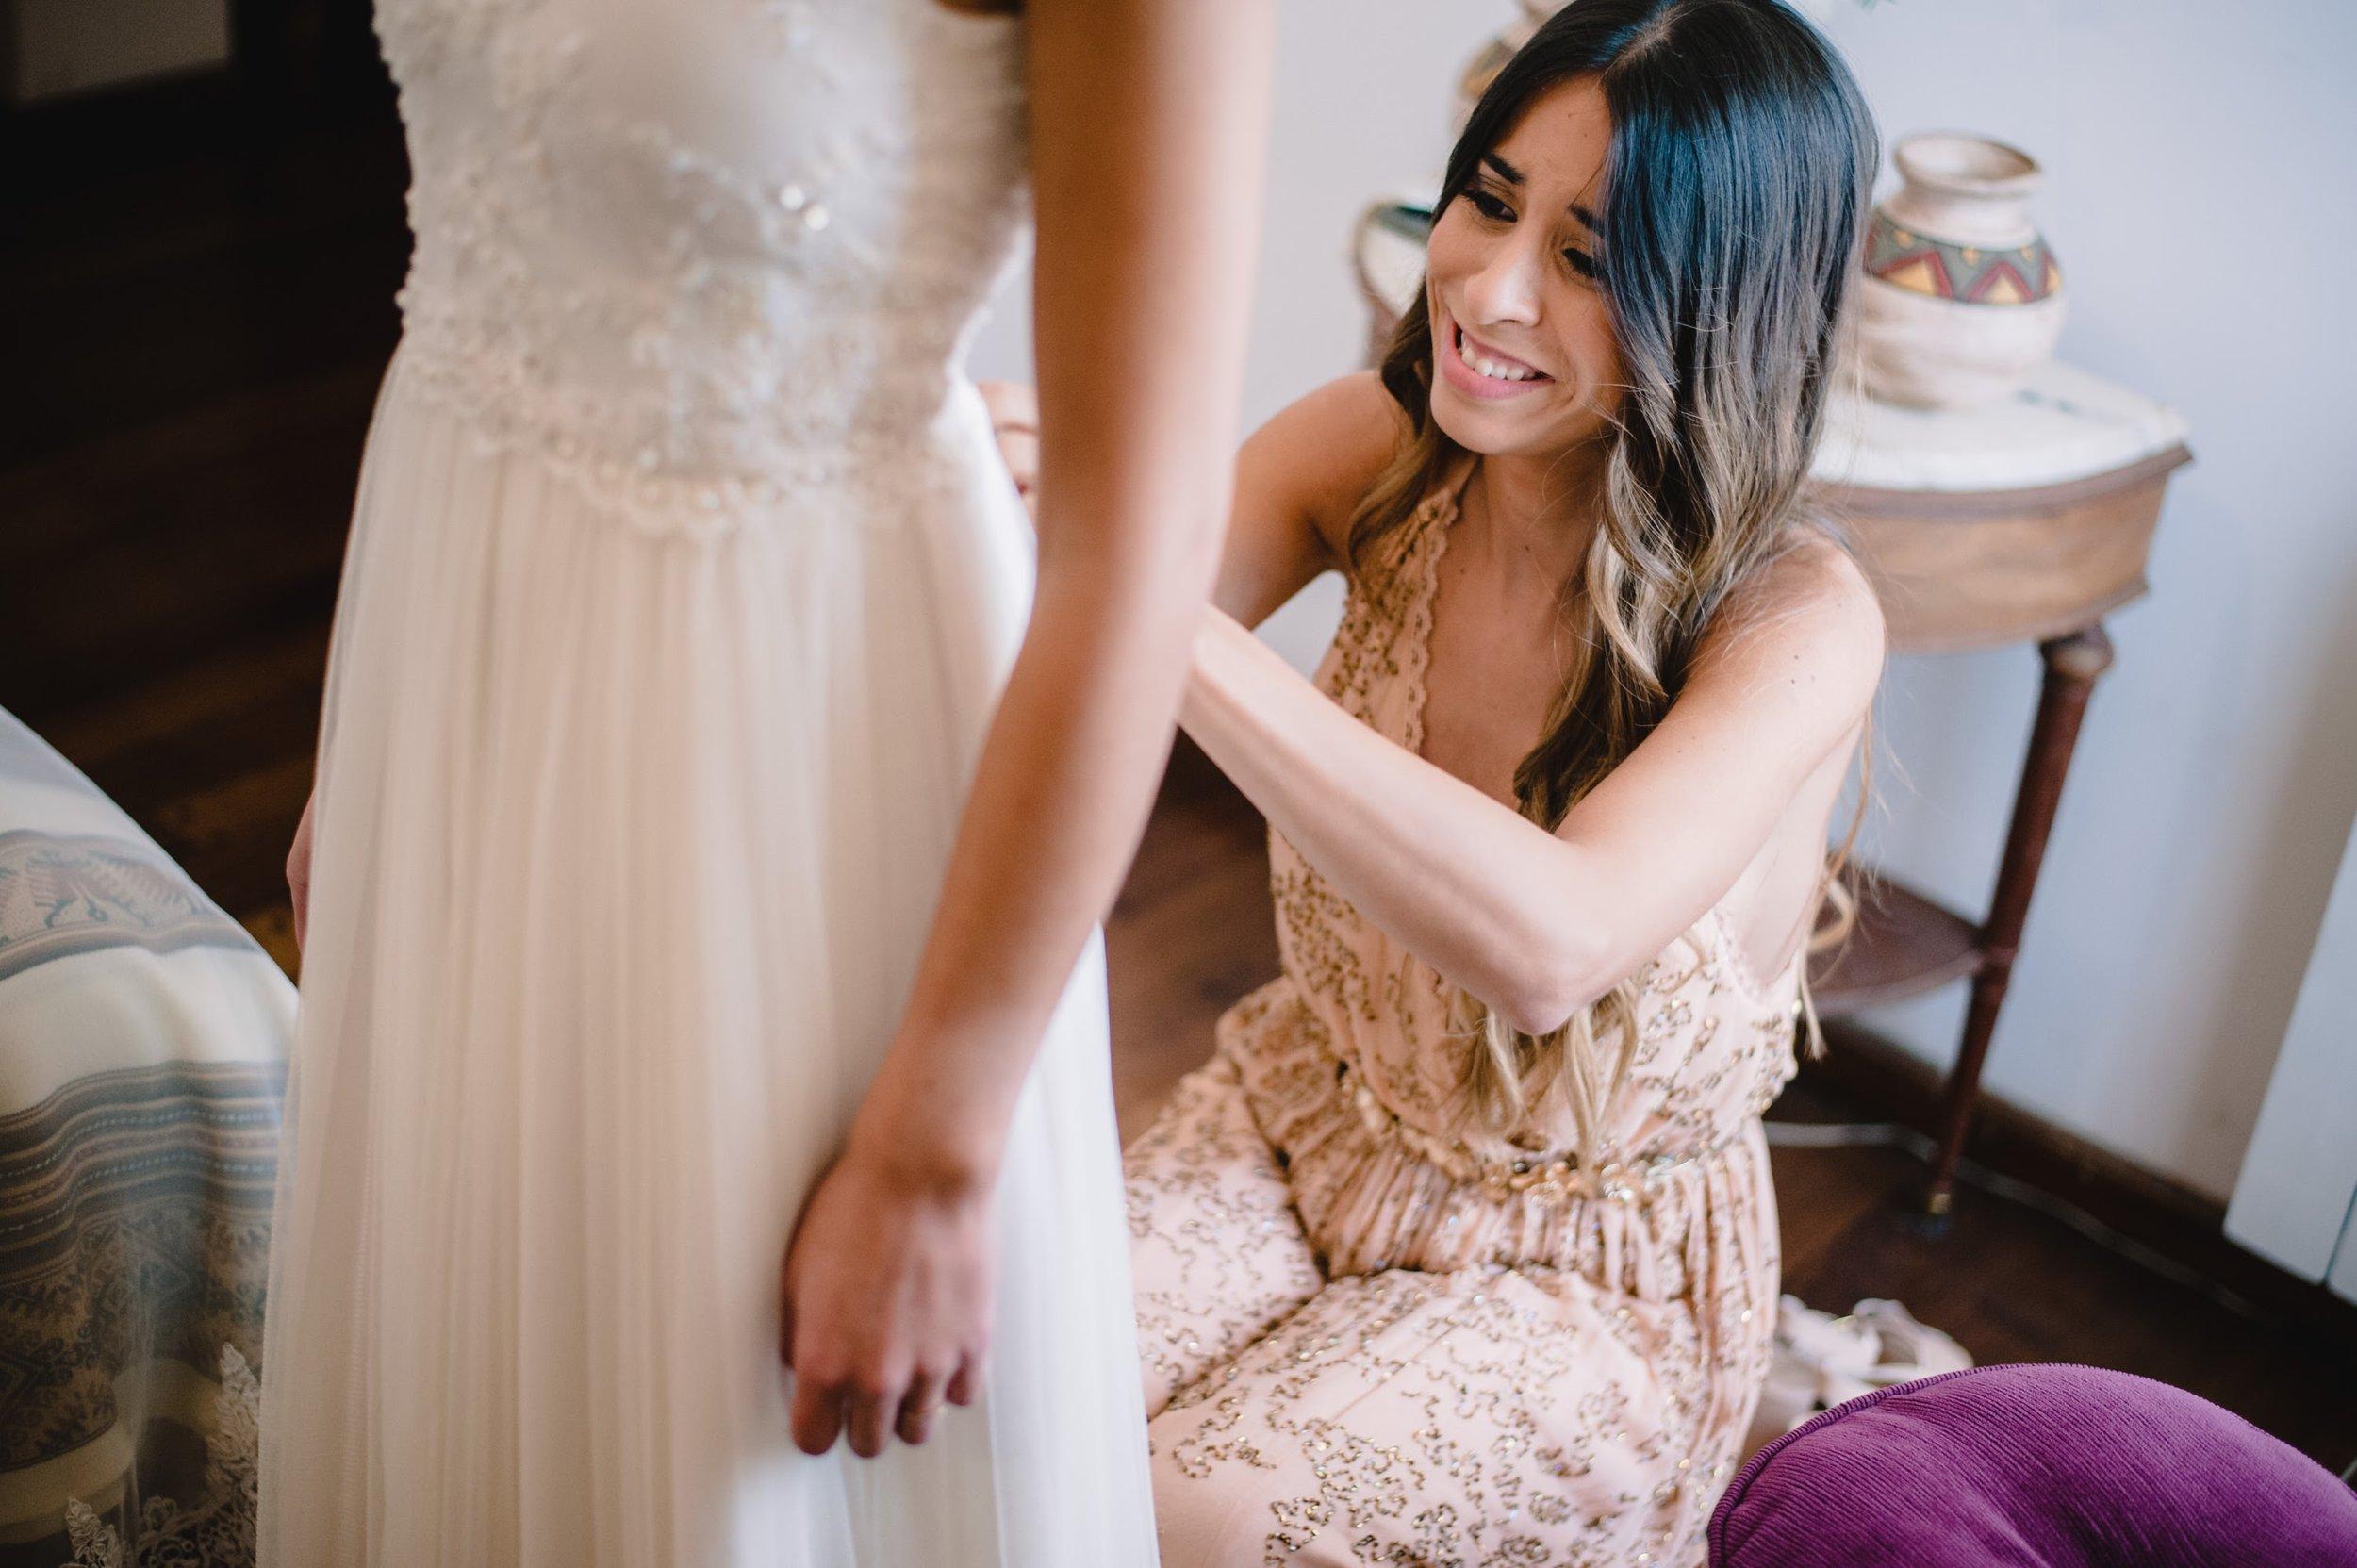 fotografo de bodas en carlos paz cordoba 007.JPG